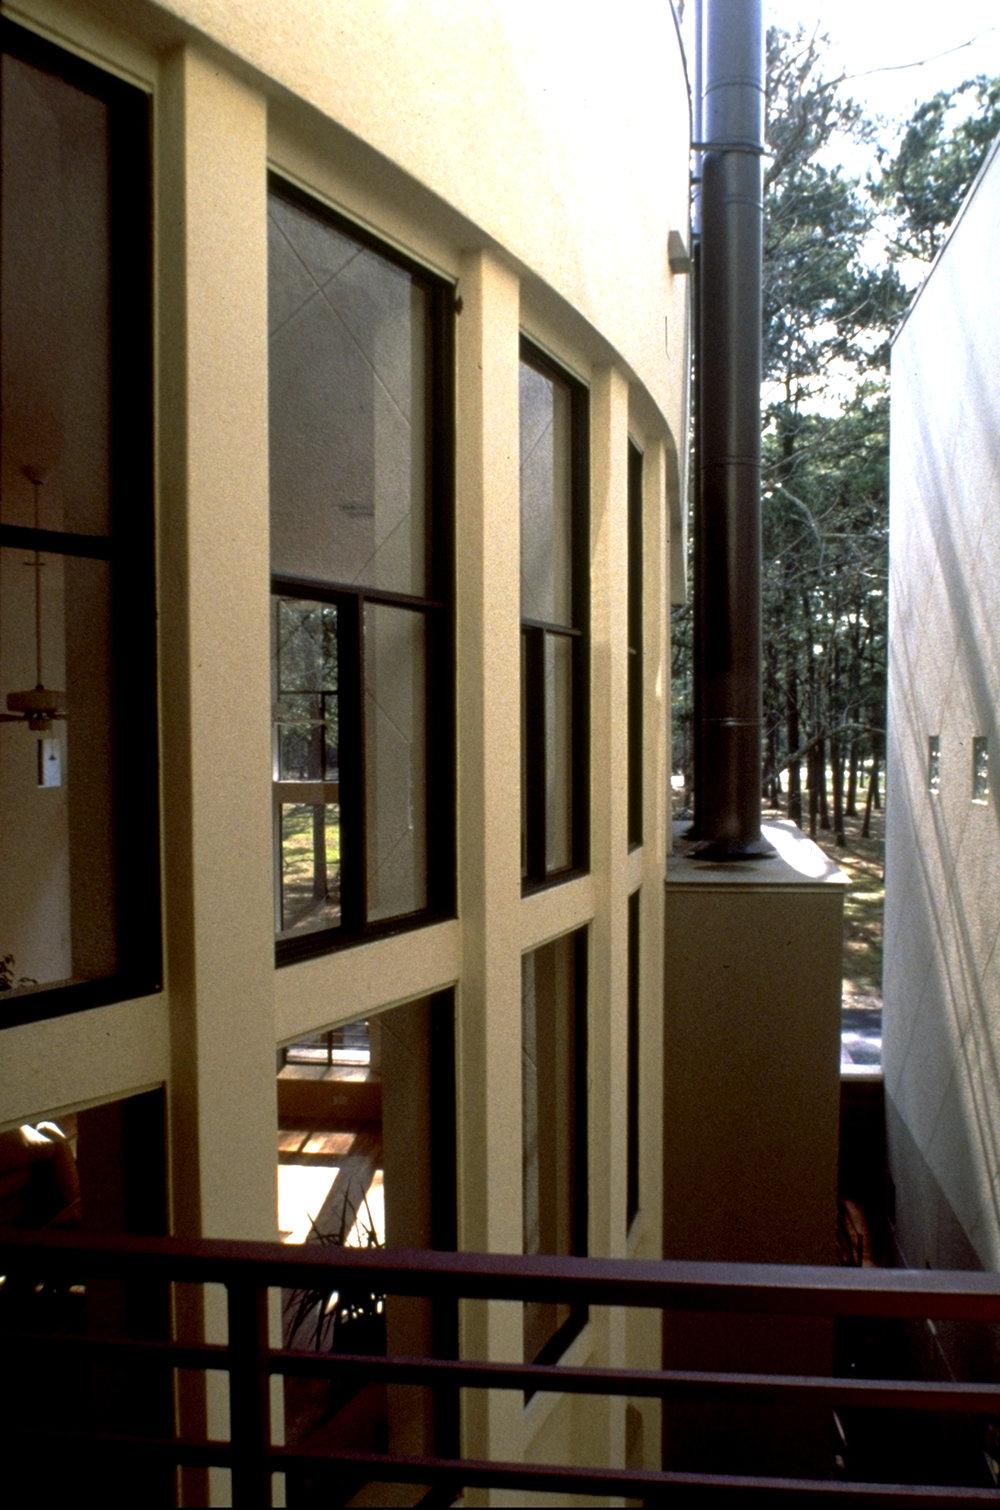 HASKELL-balcony view to parkwebsite.jpg